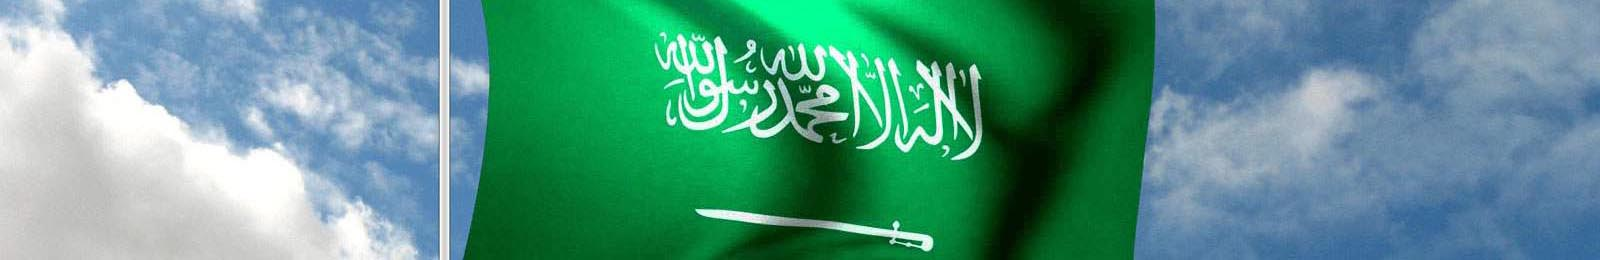 how to get resident visa in saudi arabia